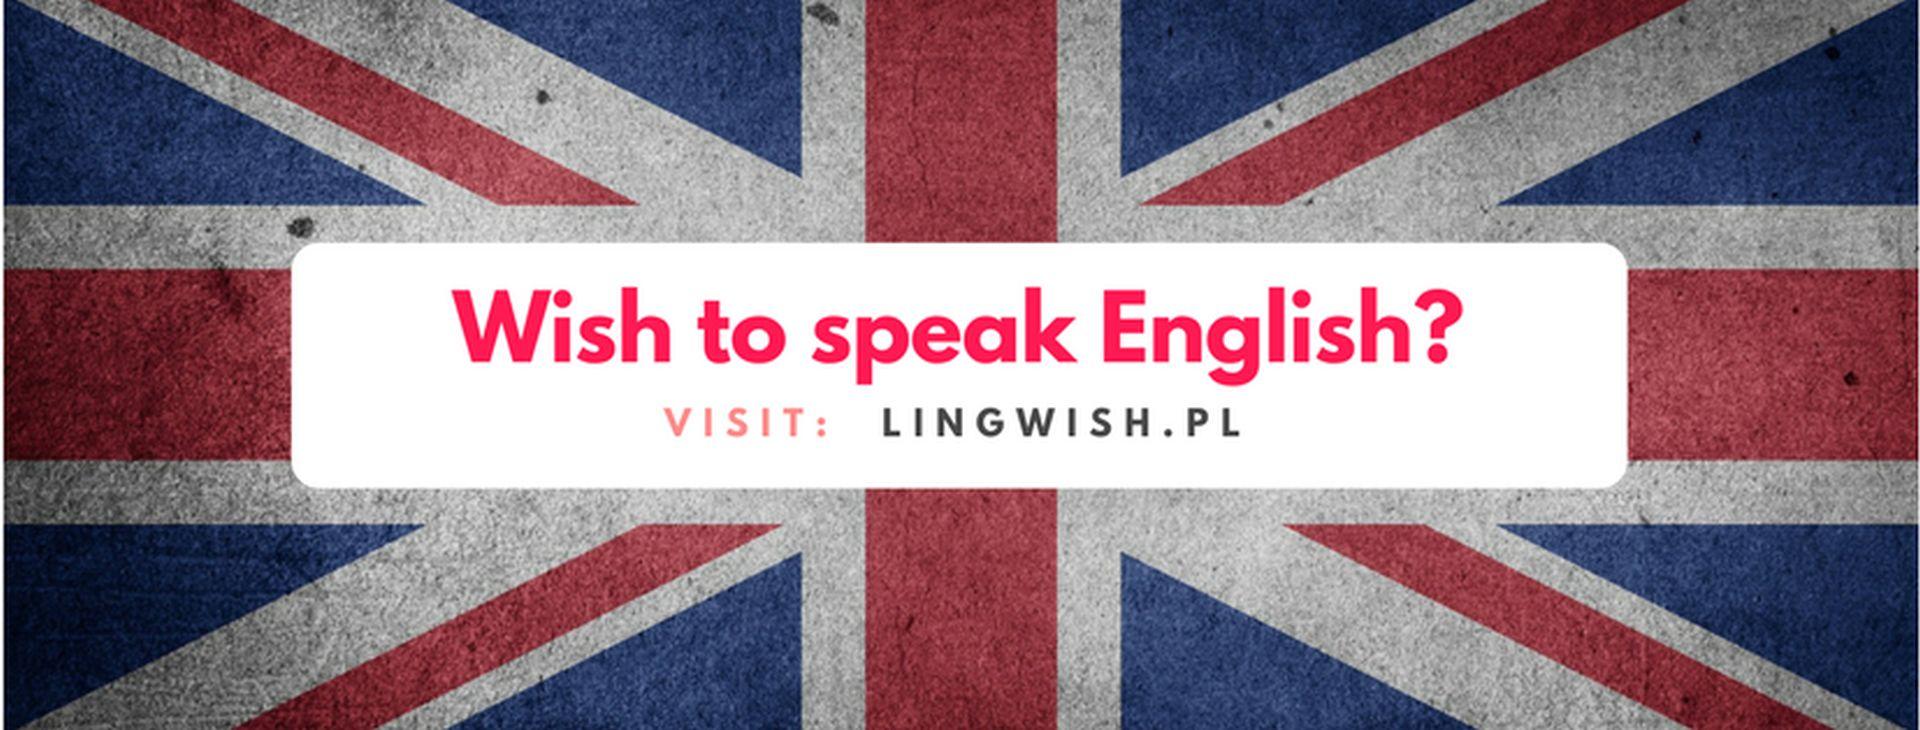 LingWish